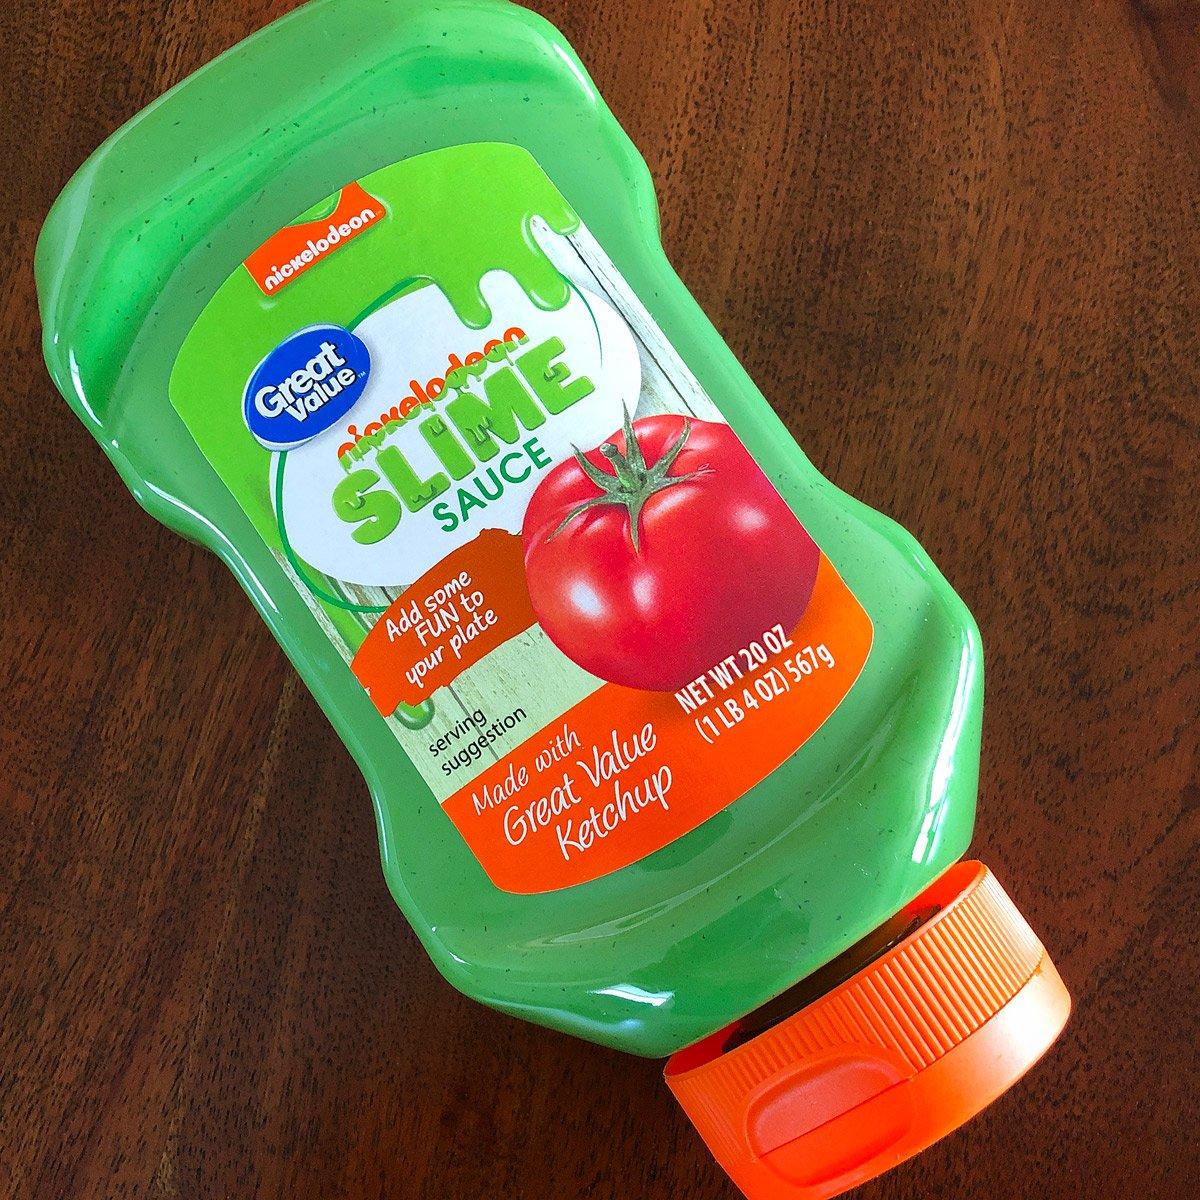 Nickelodeon Green Slime Sauce Ketchup